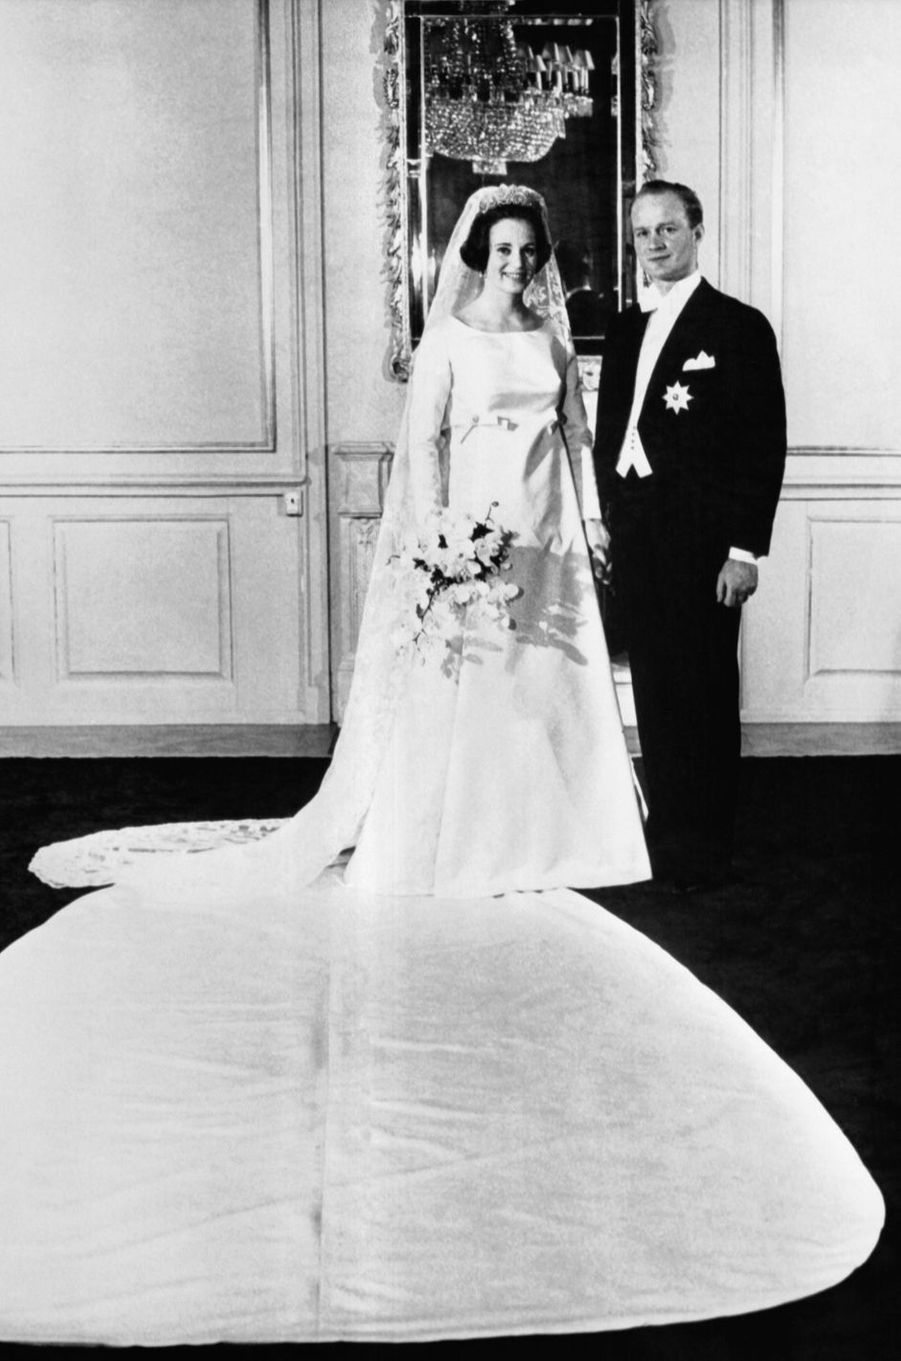 Le prince Richard zu Sayn-Wittgenstein-Berleburg lors de son mariage avec la princesse Benedikte de Danemark, le 3 février 1968